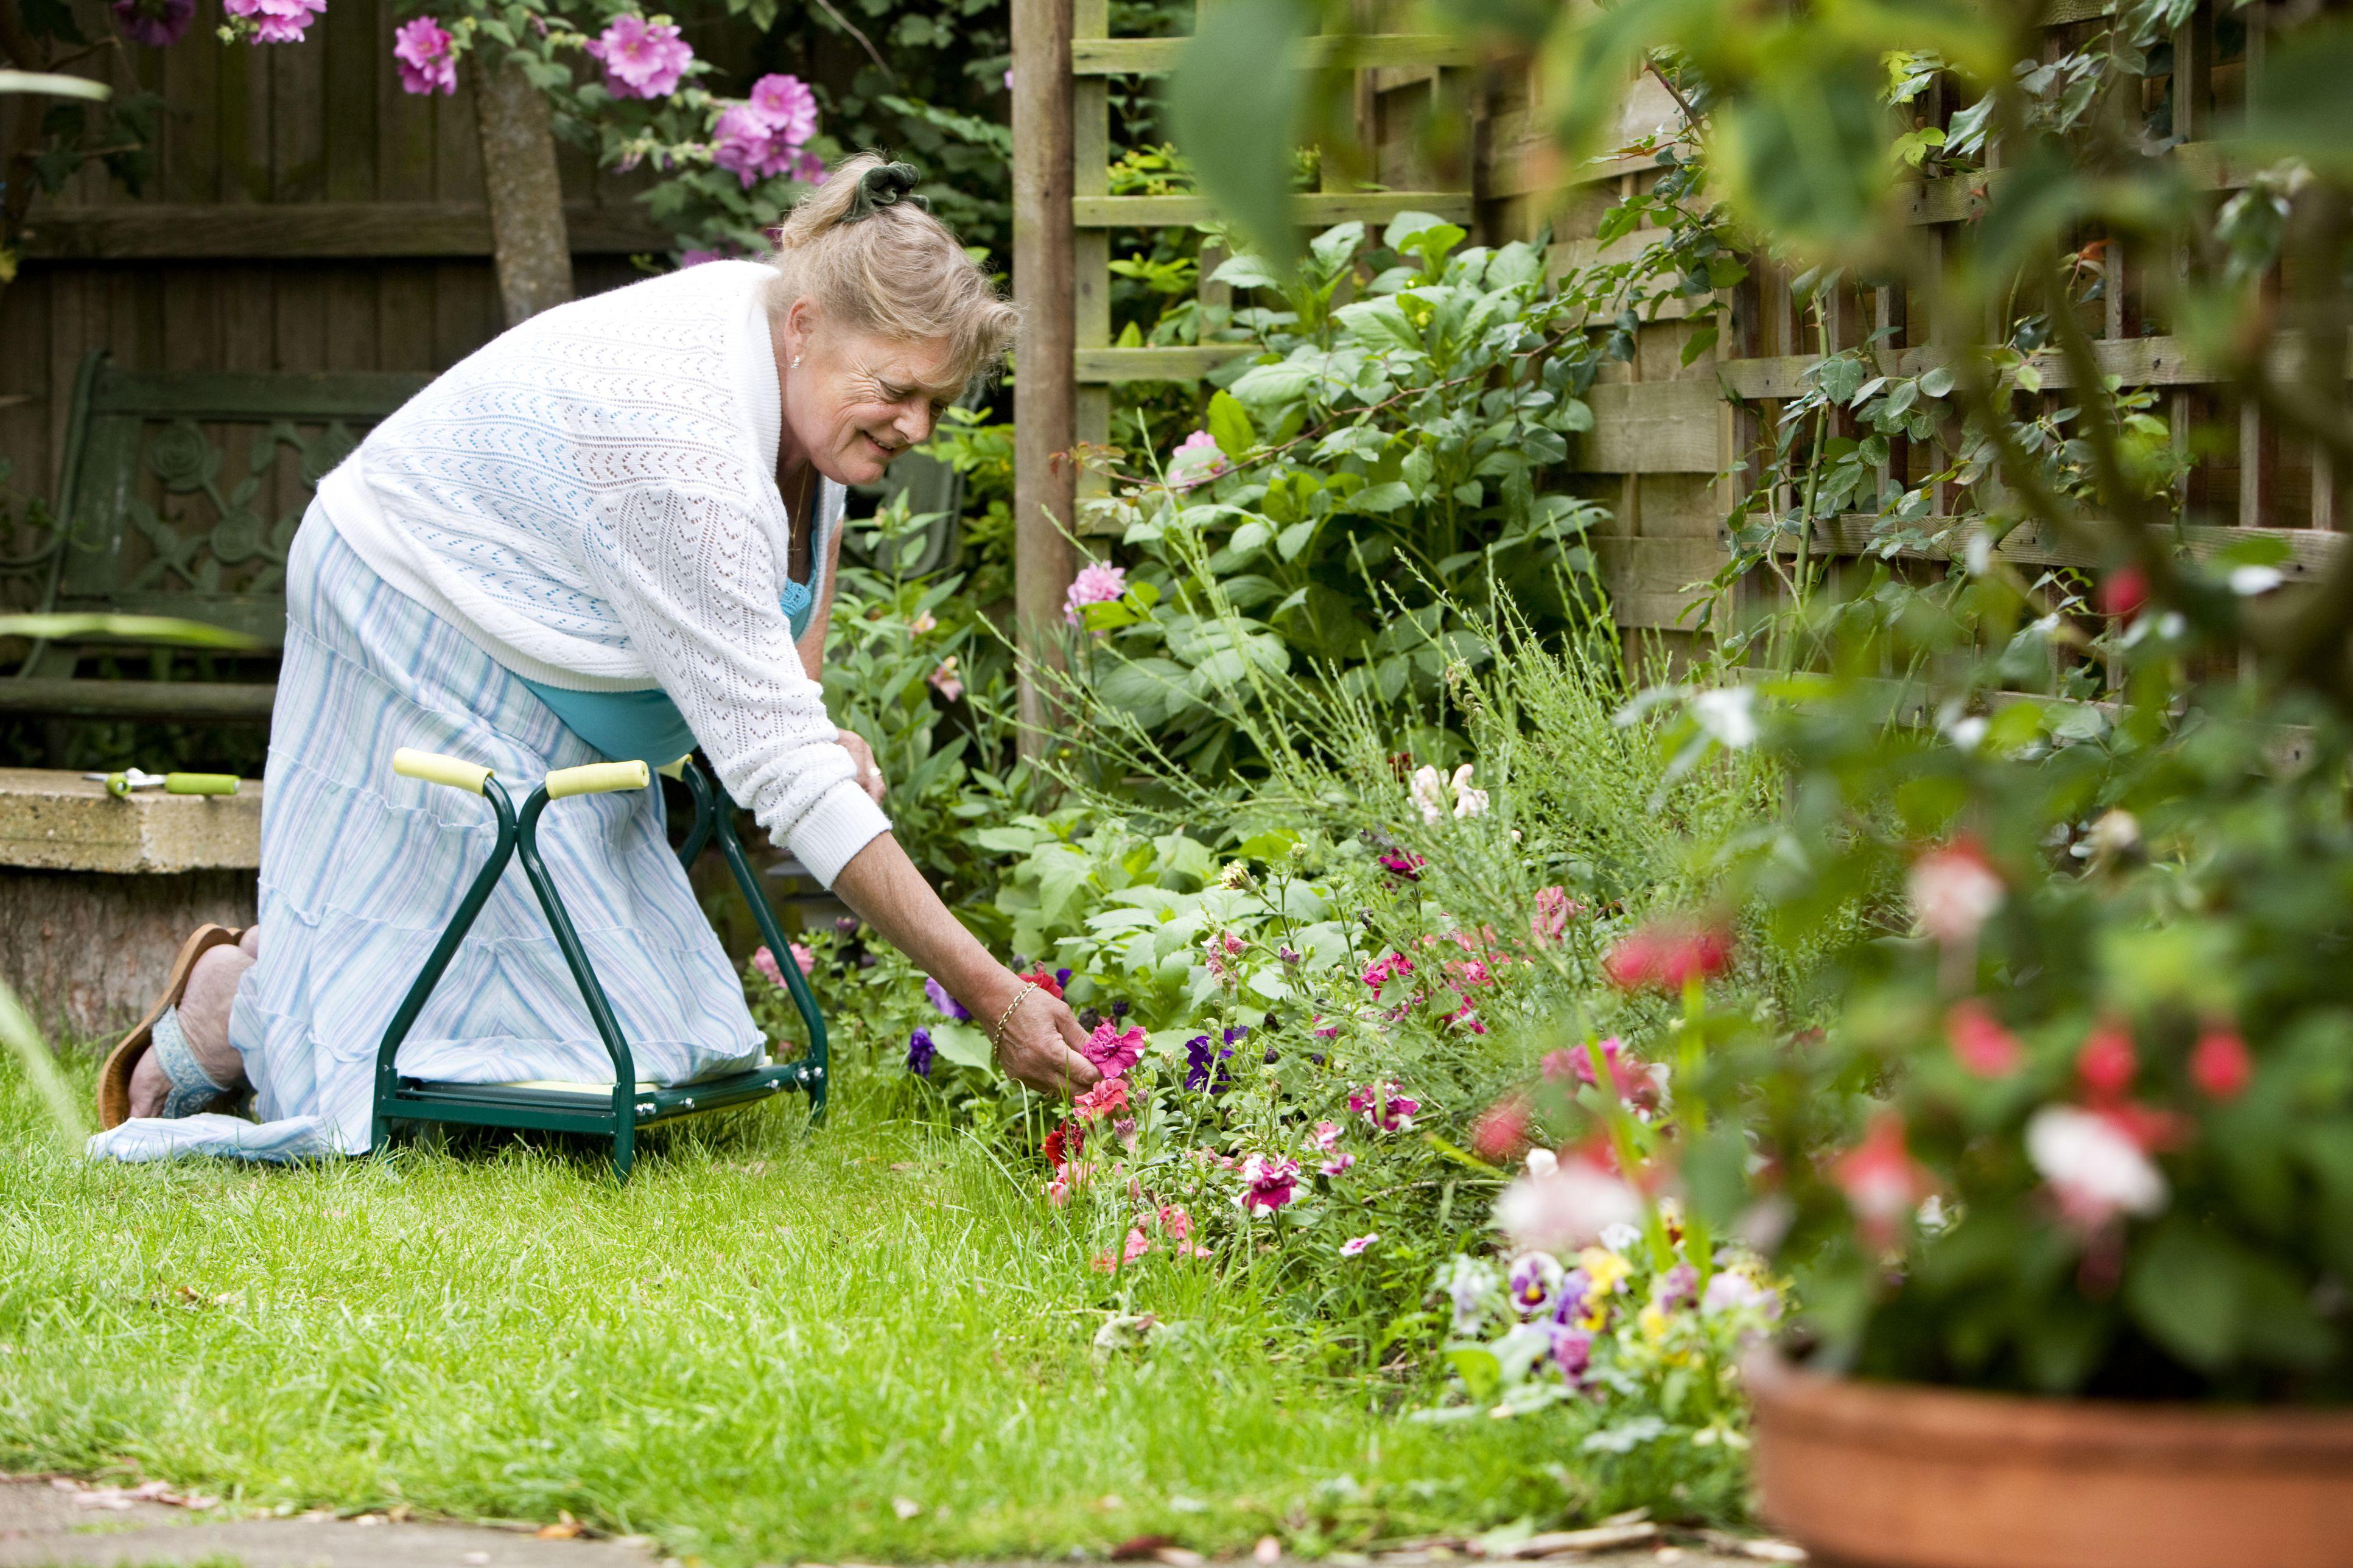 Ergonomic Garden Tools for People With Arthritis